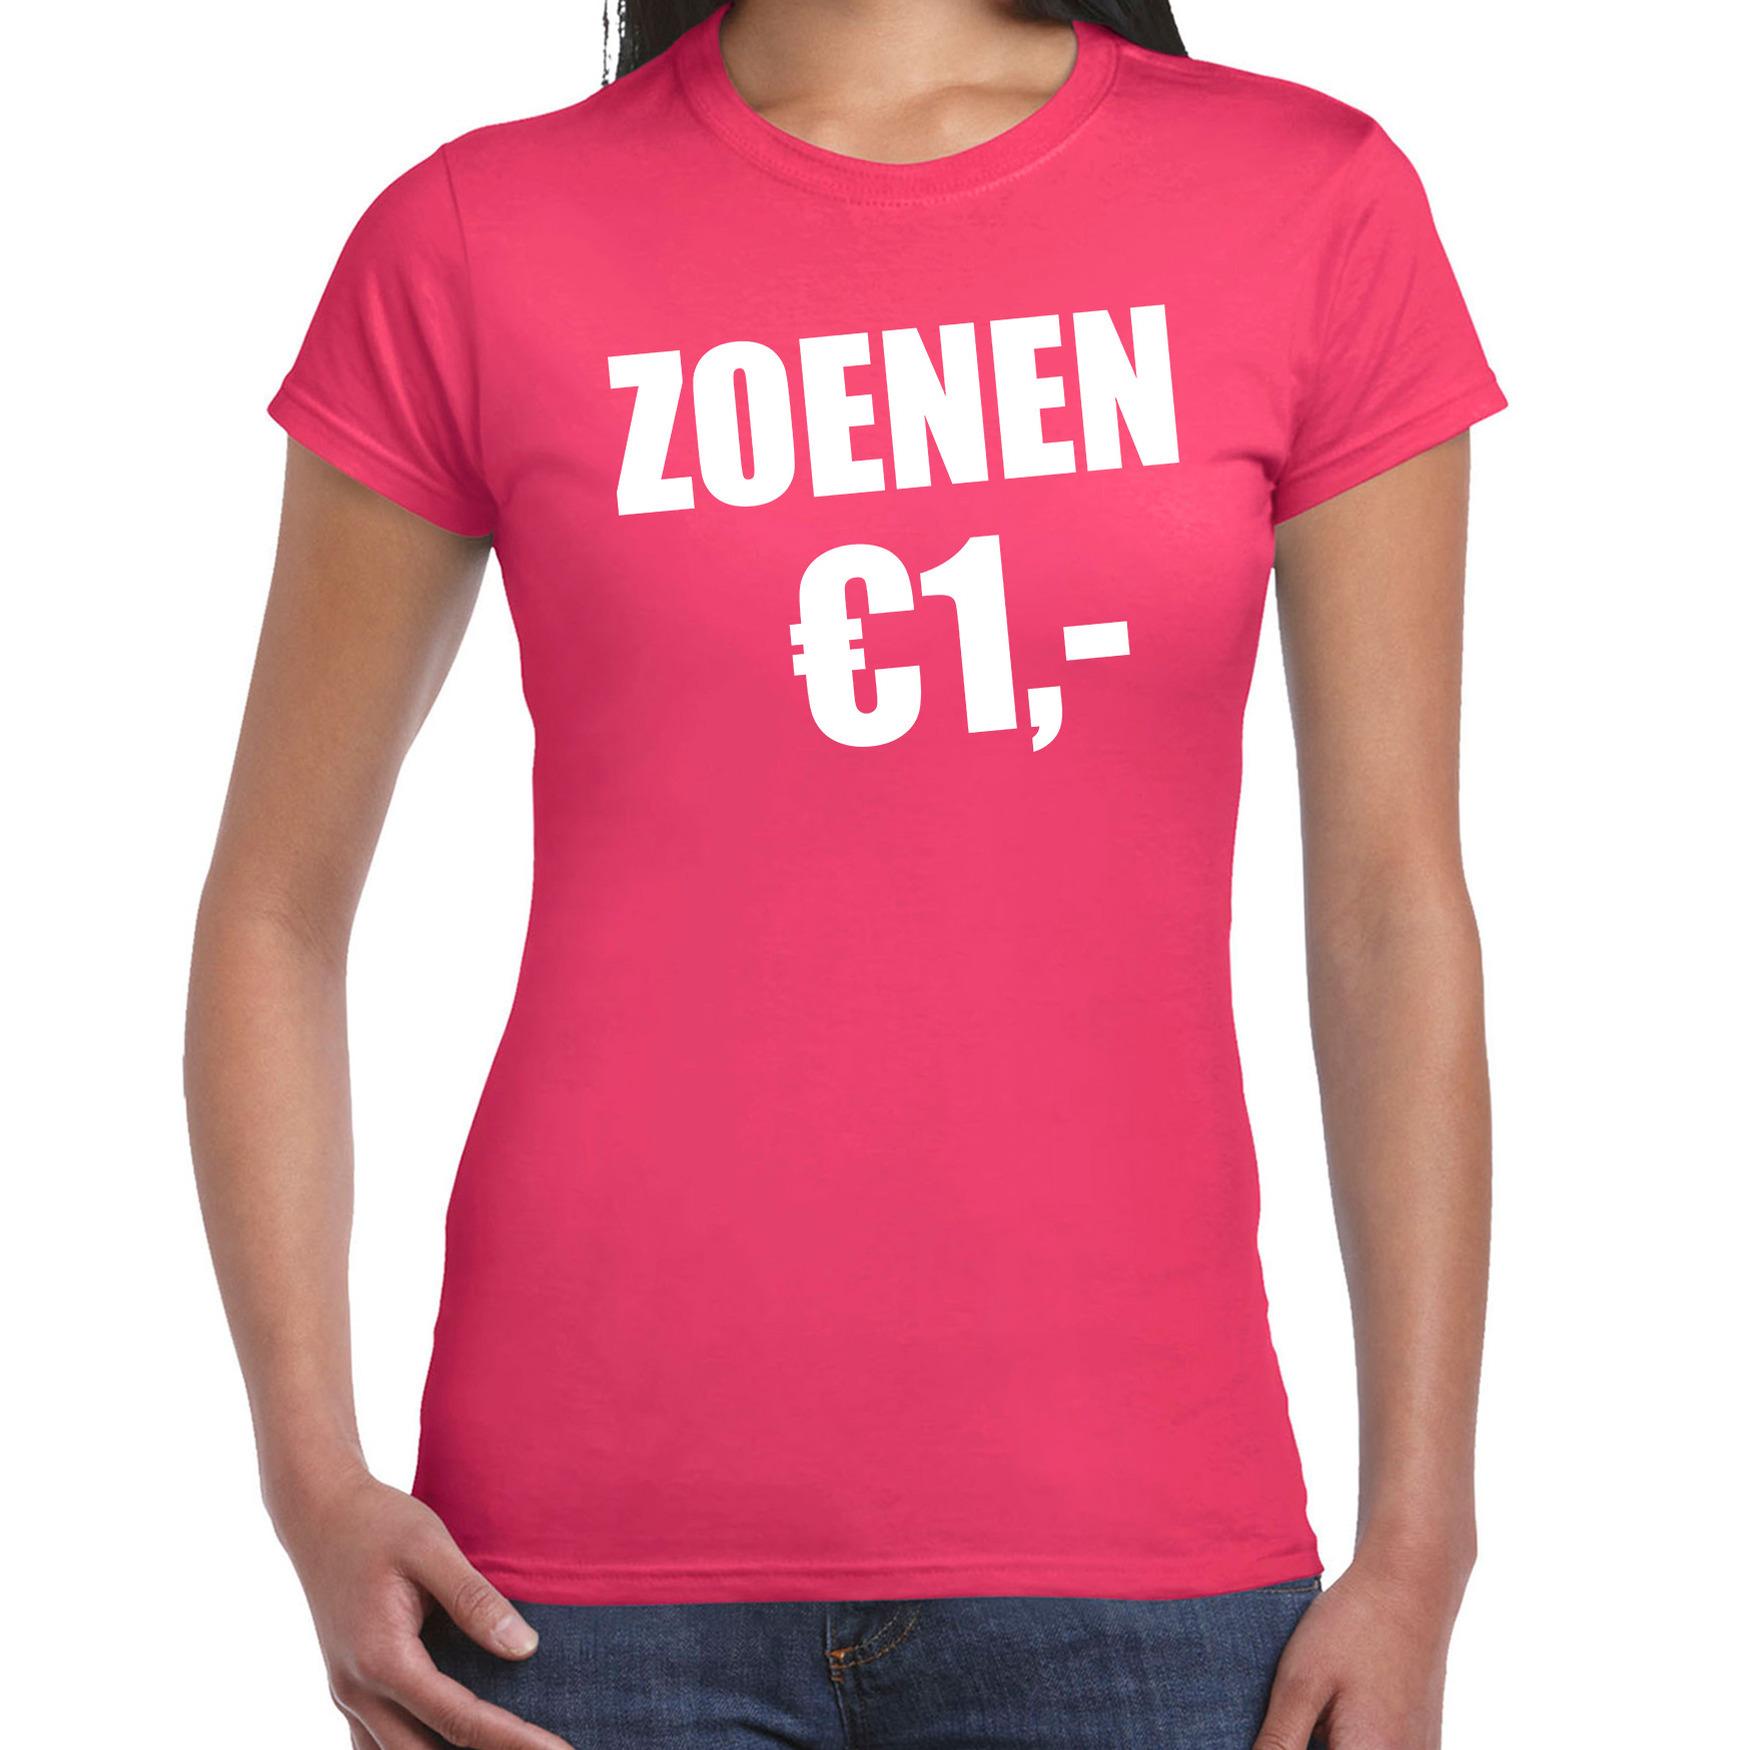 Fun t-shirt zoenen 1 euro roze voor dames L -